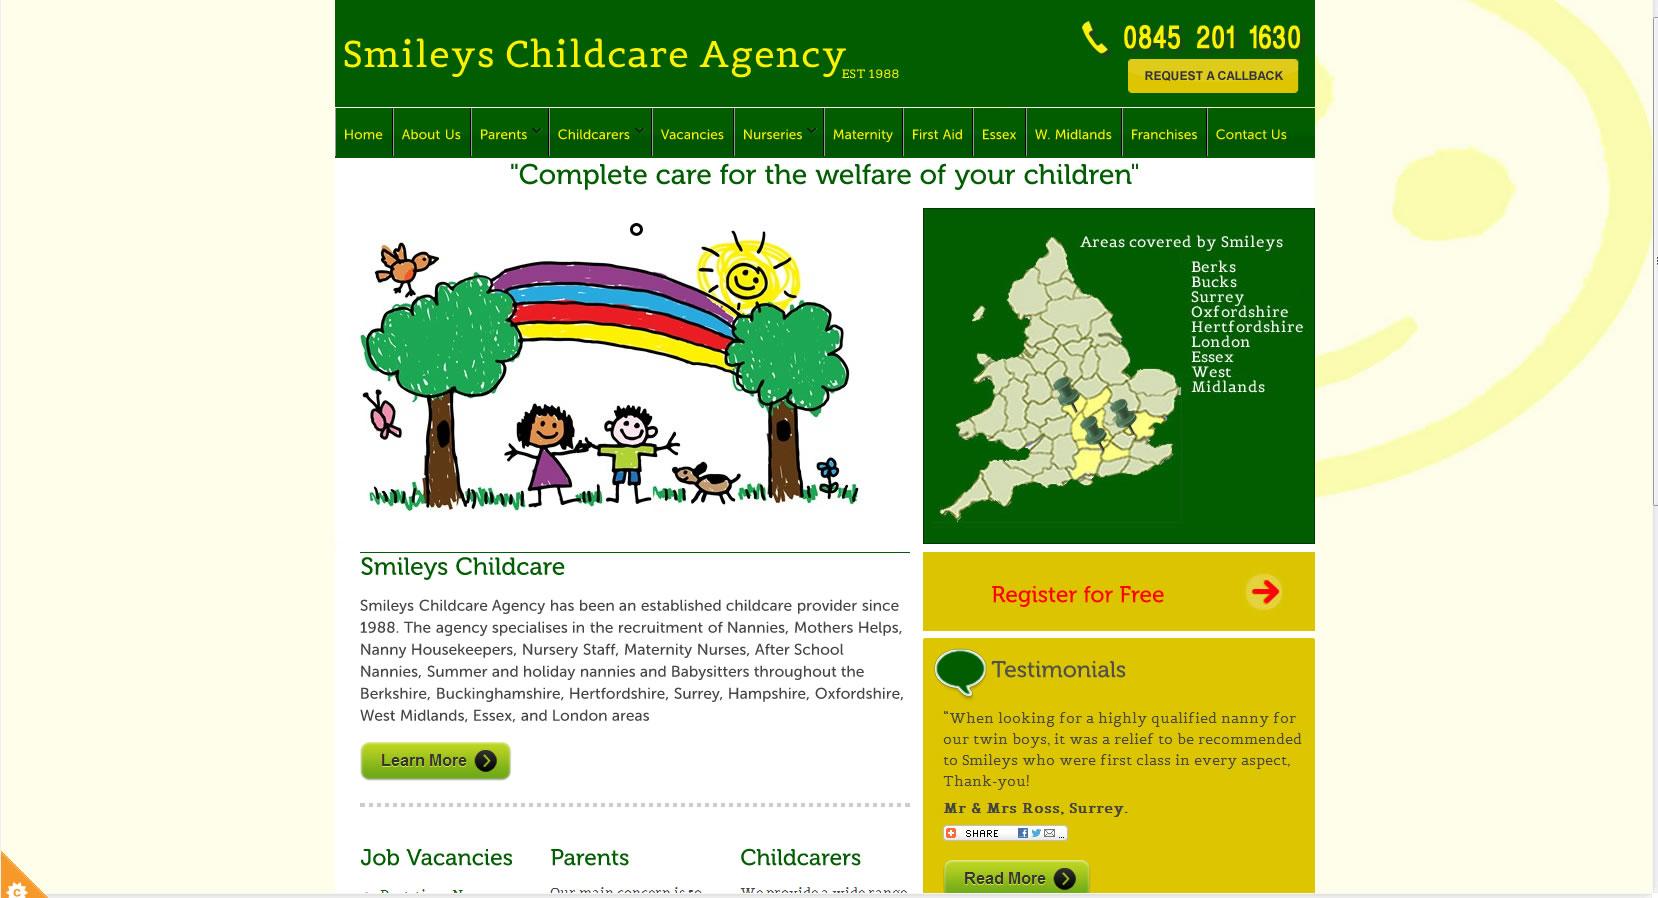 Smileys Childcare